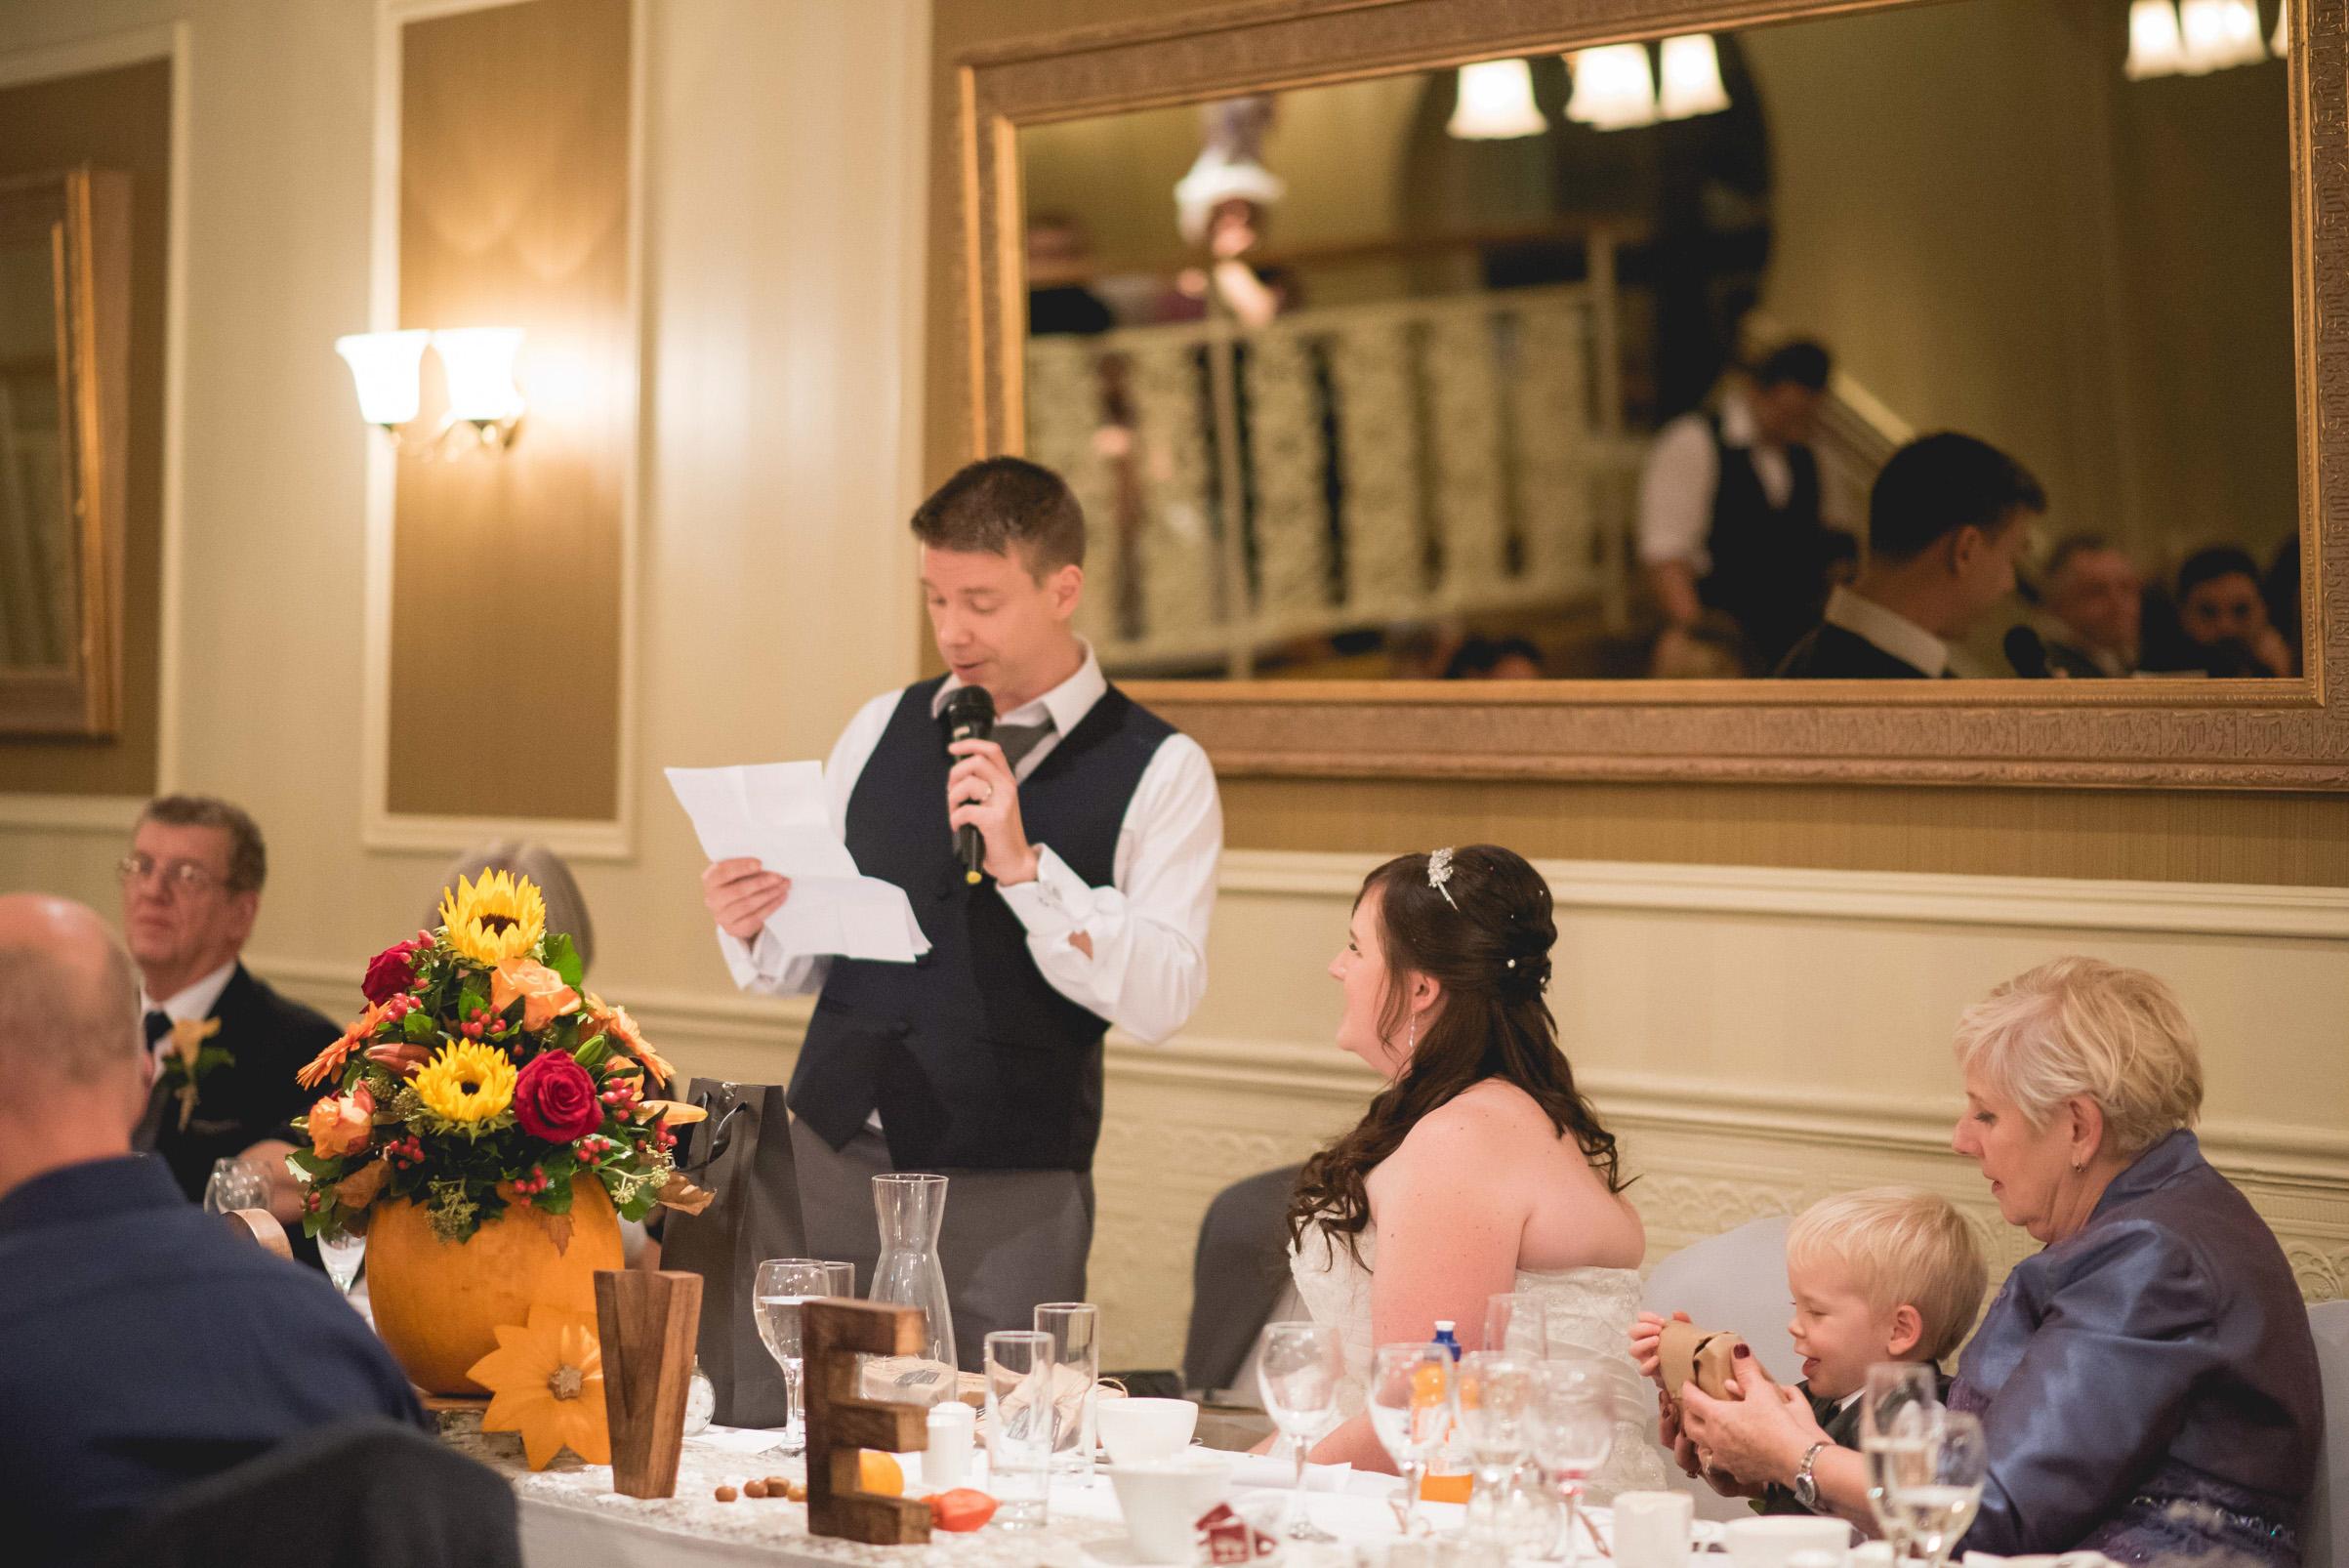 The+Fairlawns+wedding+Aldridge+StLukes+Church-192.jpg